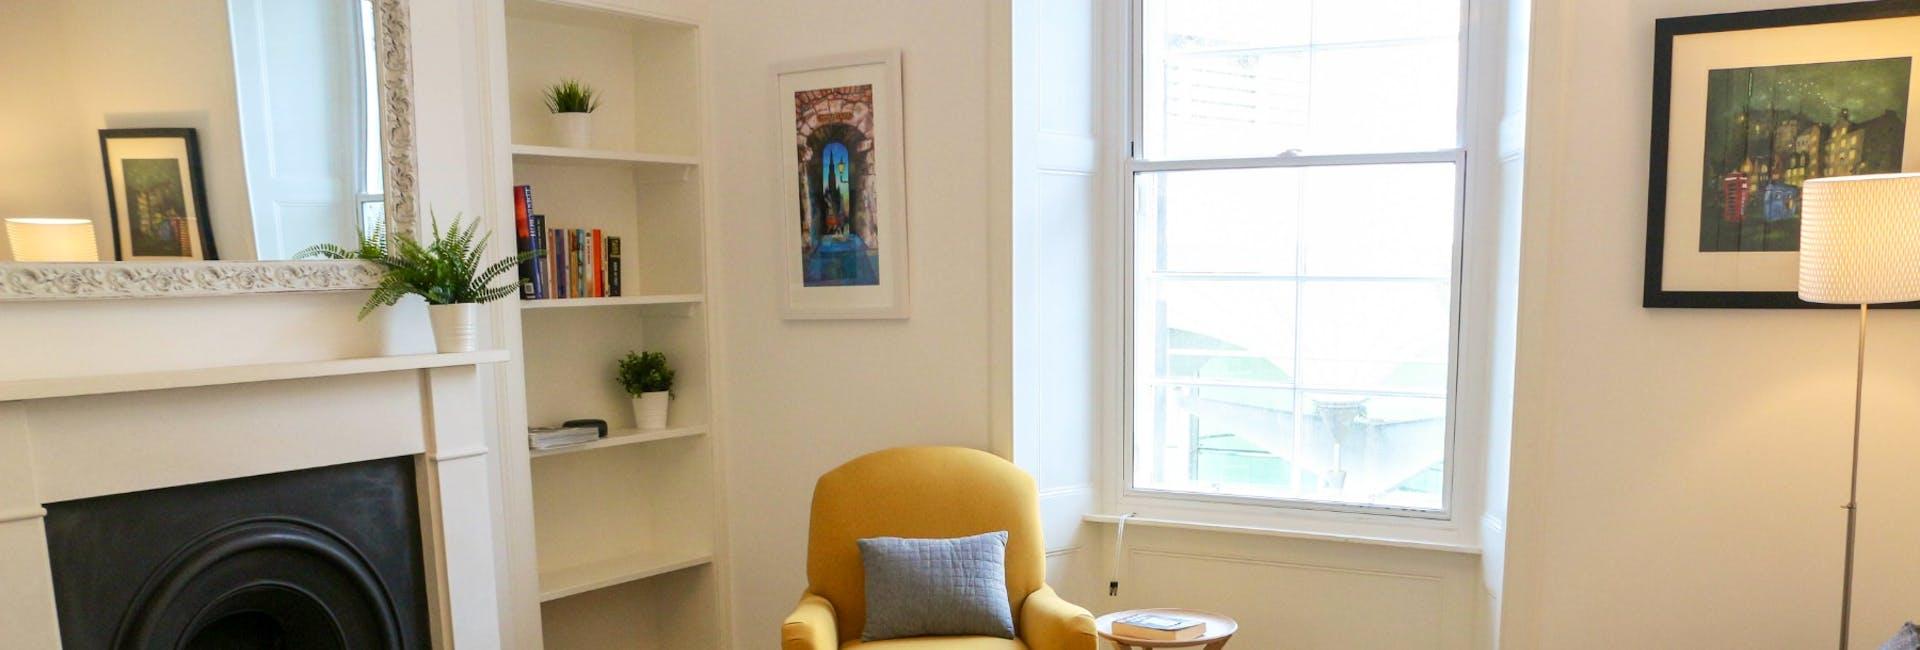 Featured Image for 93 6 Morrison Street Fountainbridge Edinburgh